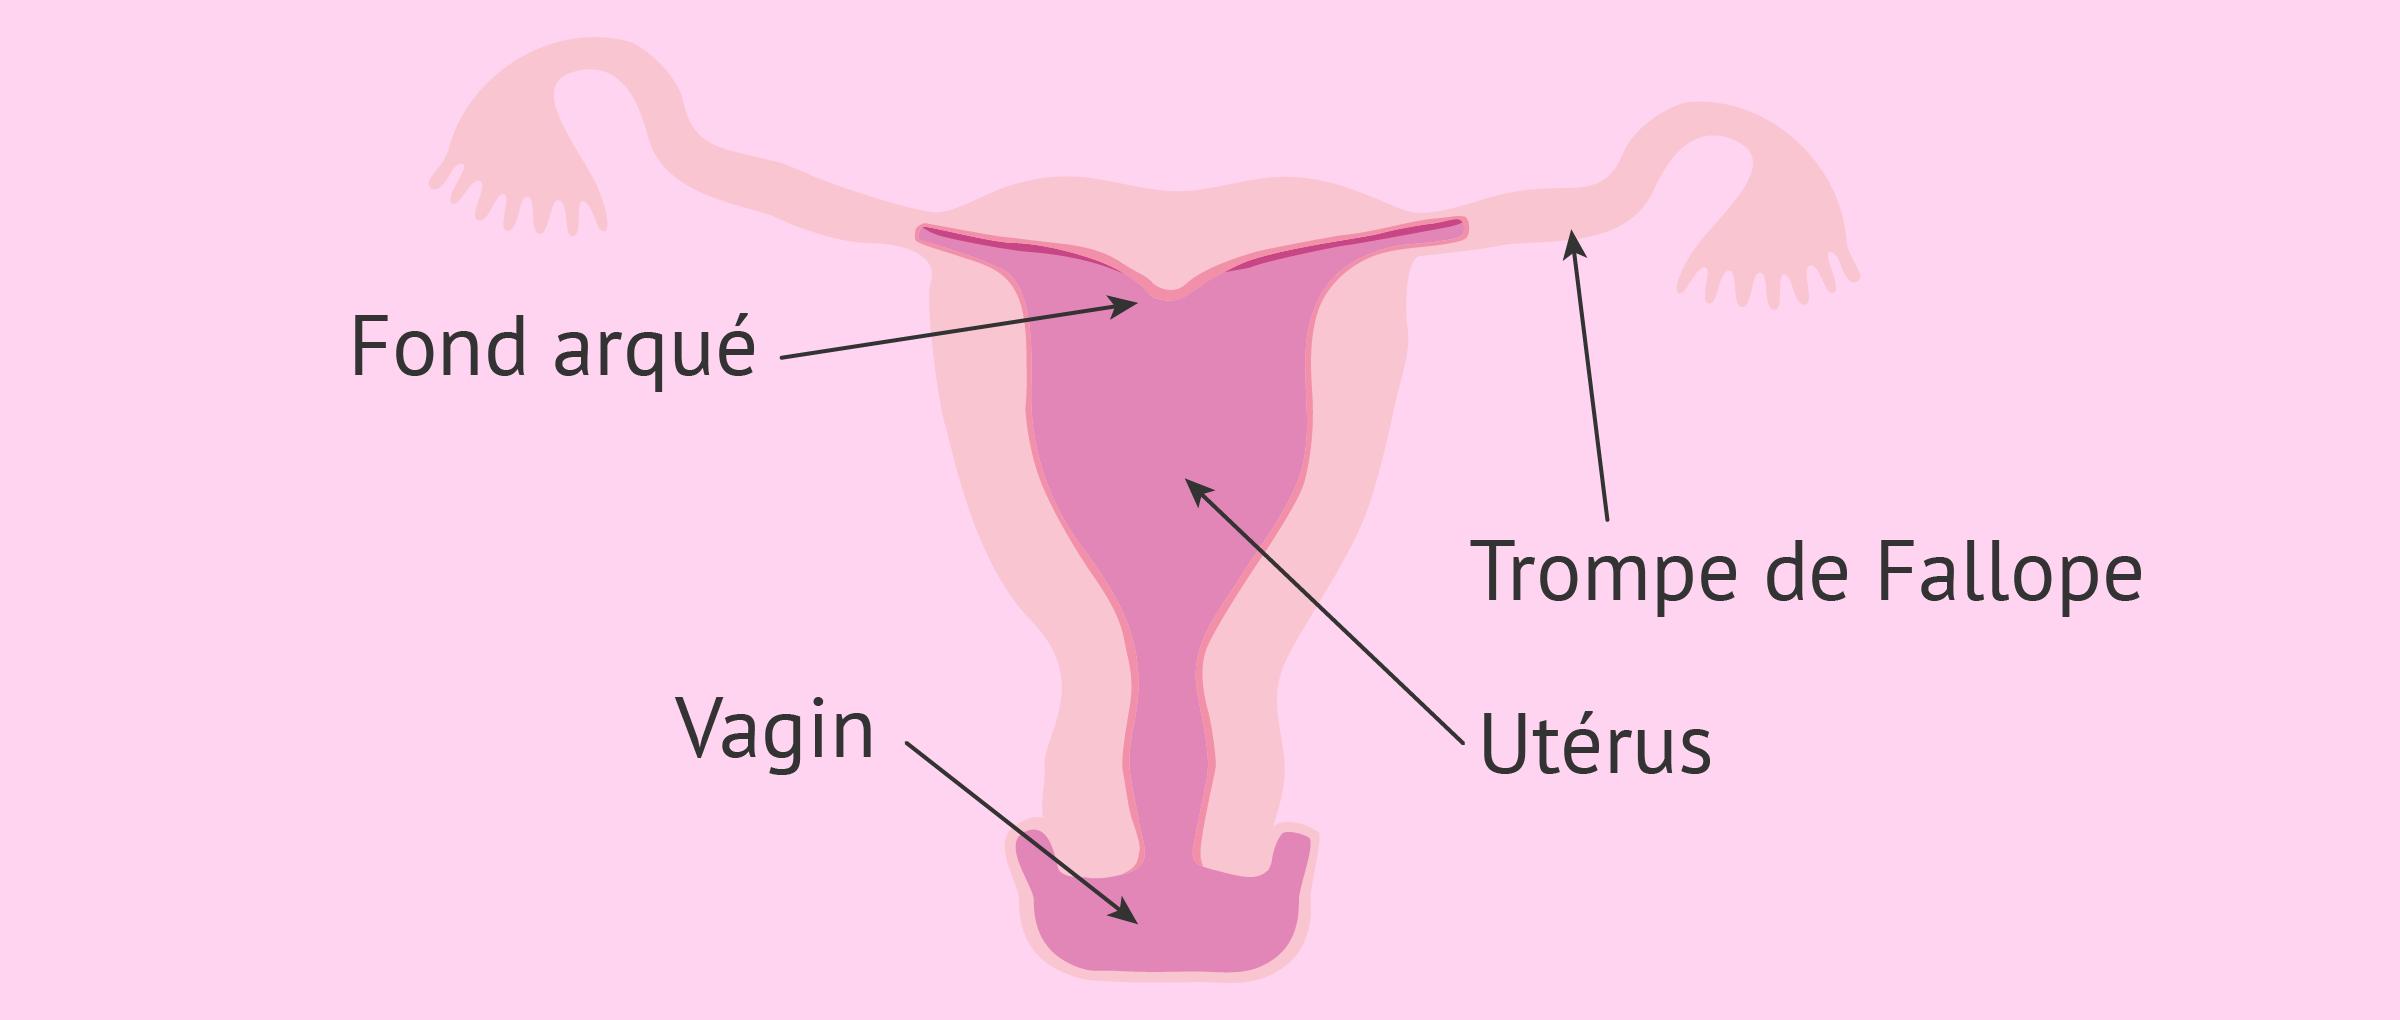 L'utérus à fond arqué